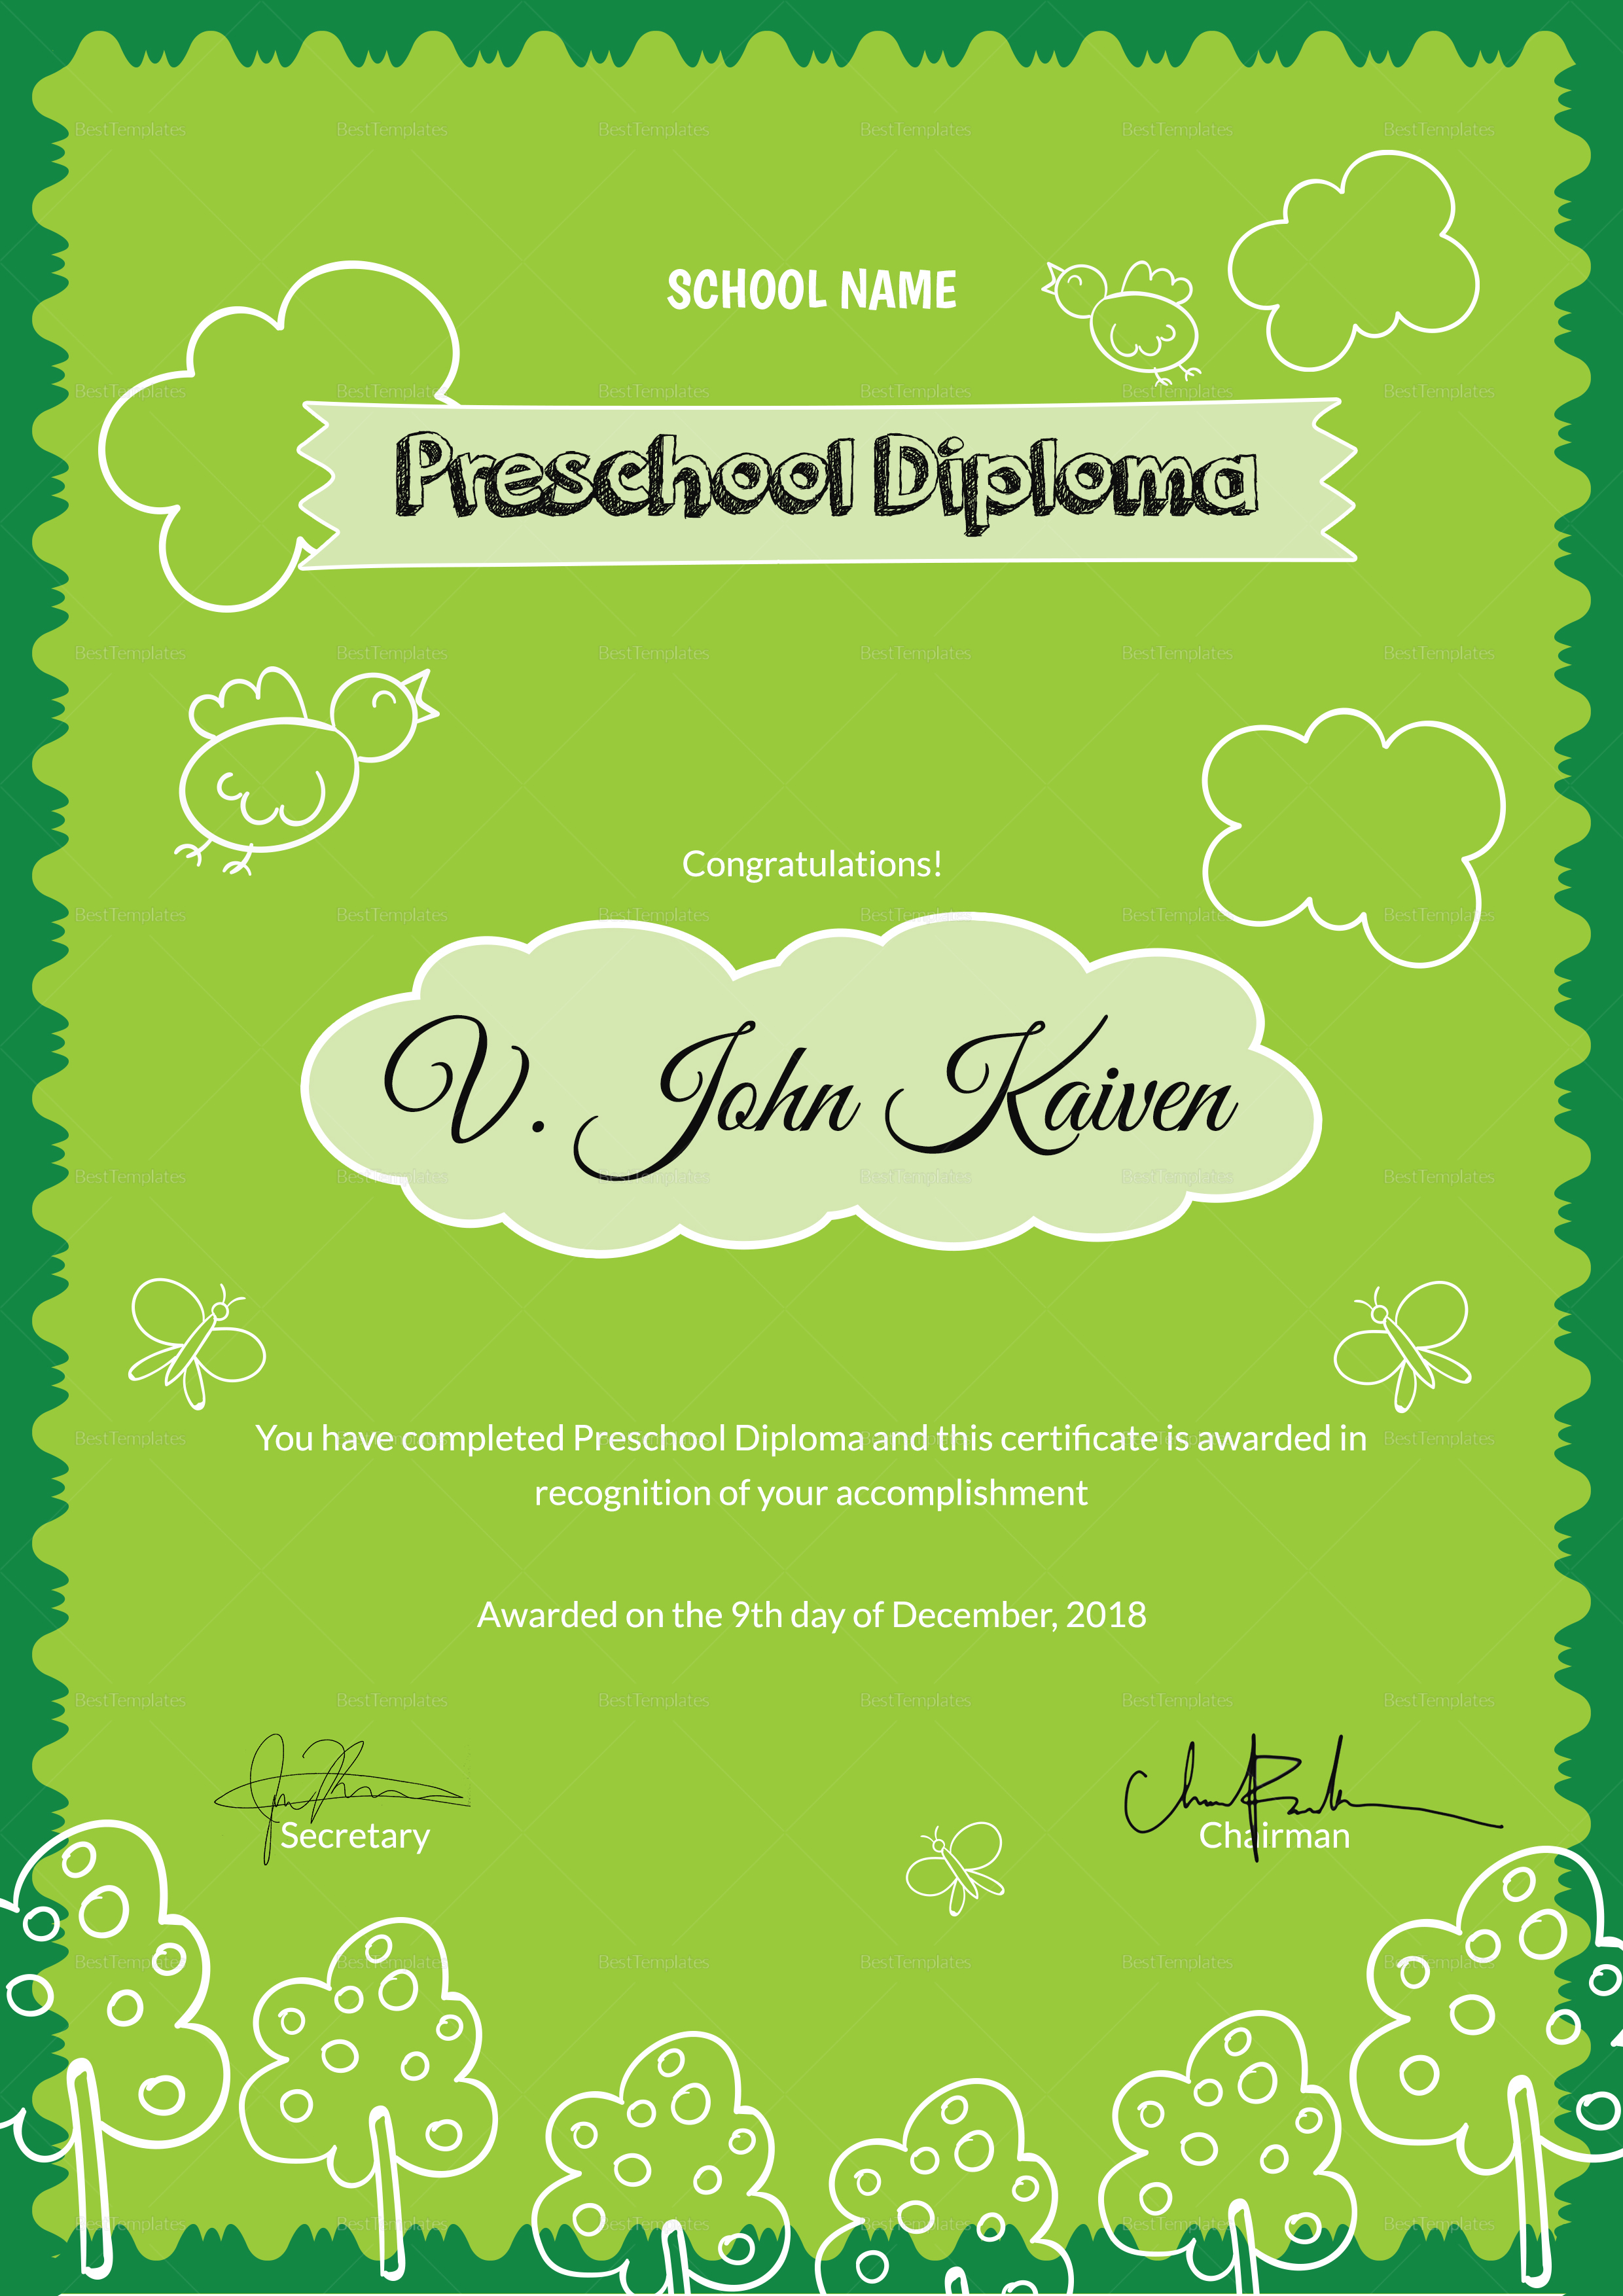 preschool award certificate design template in psd  word